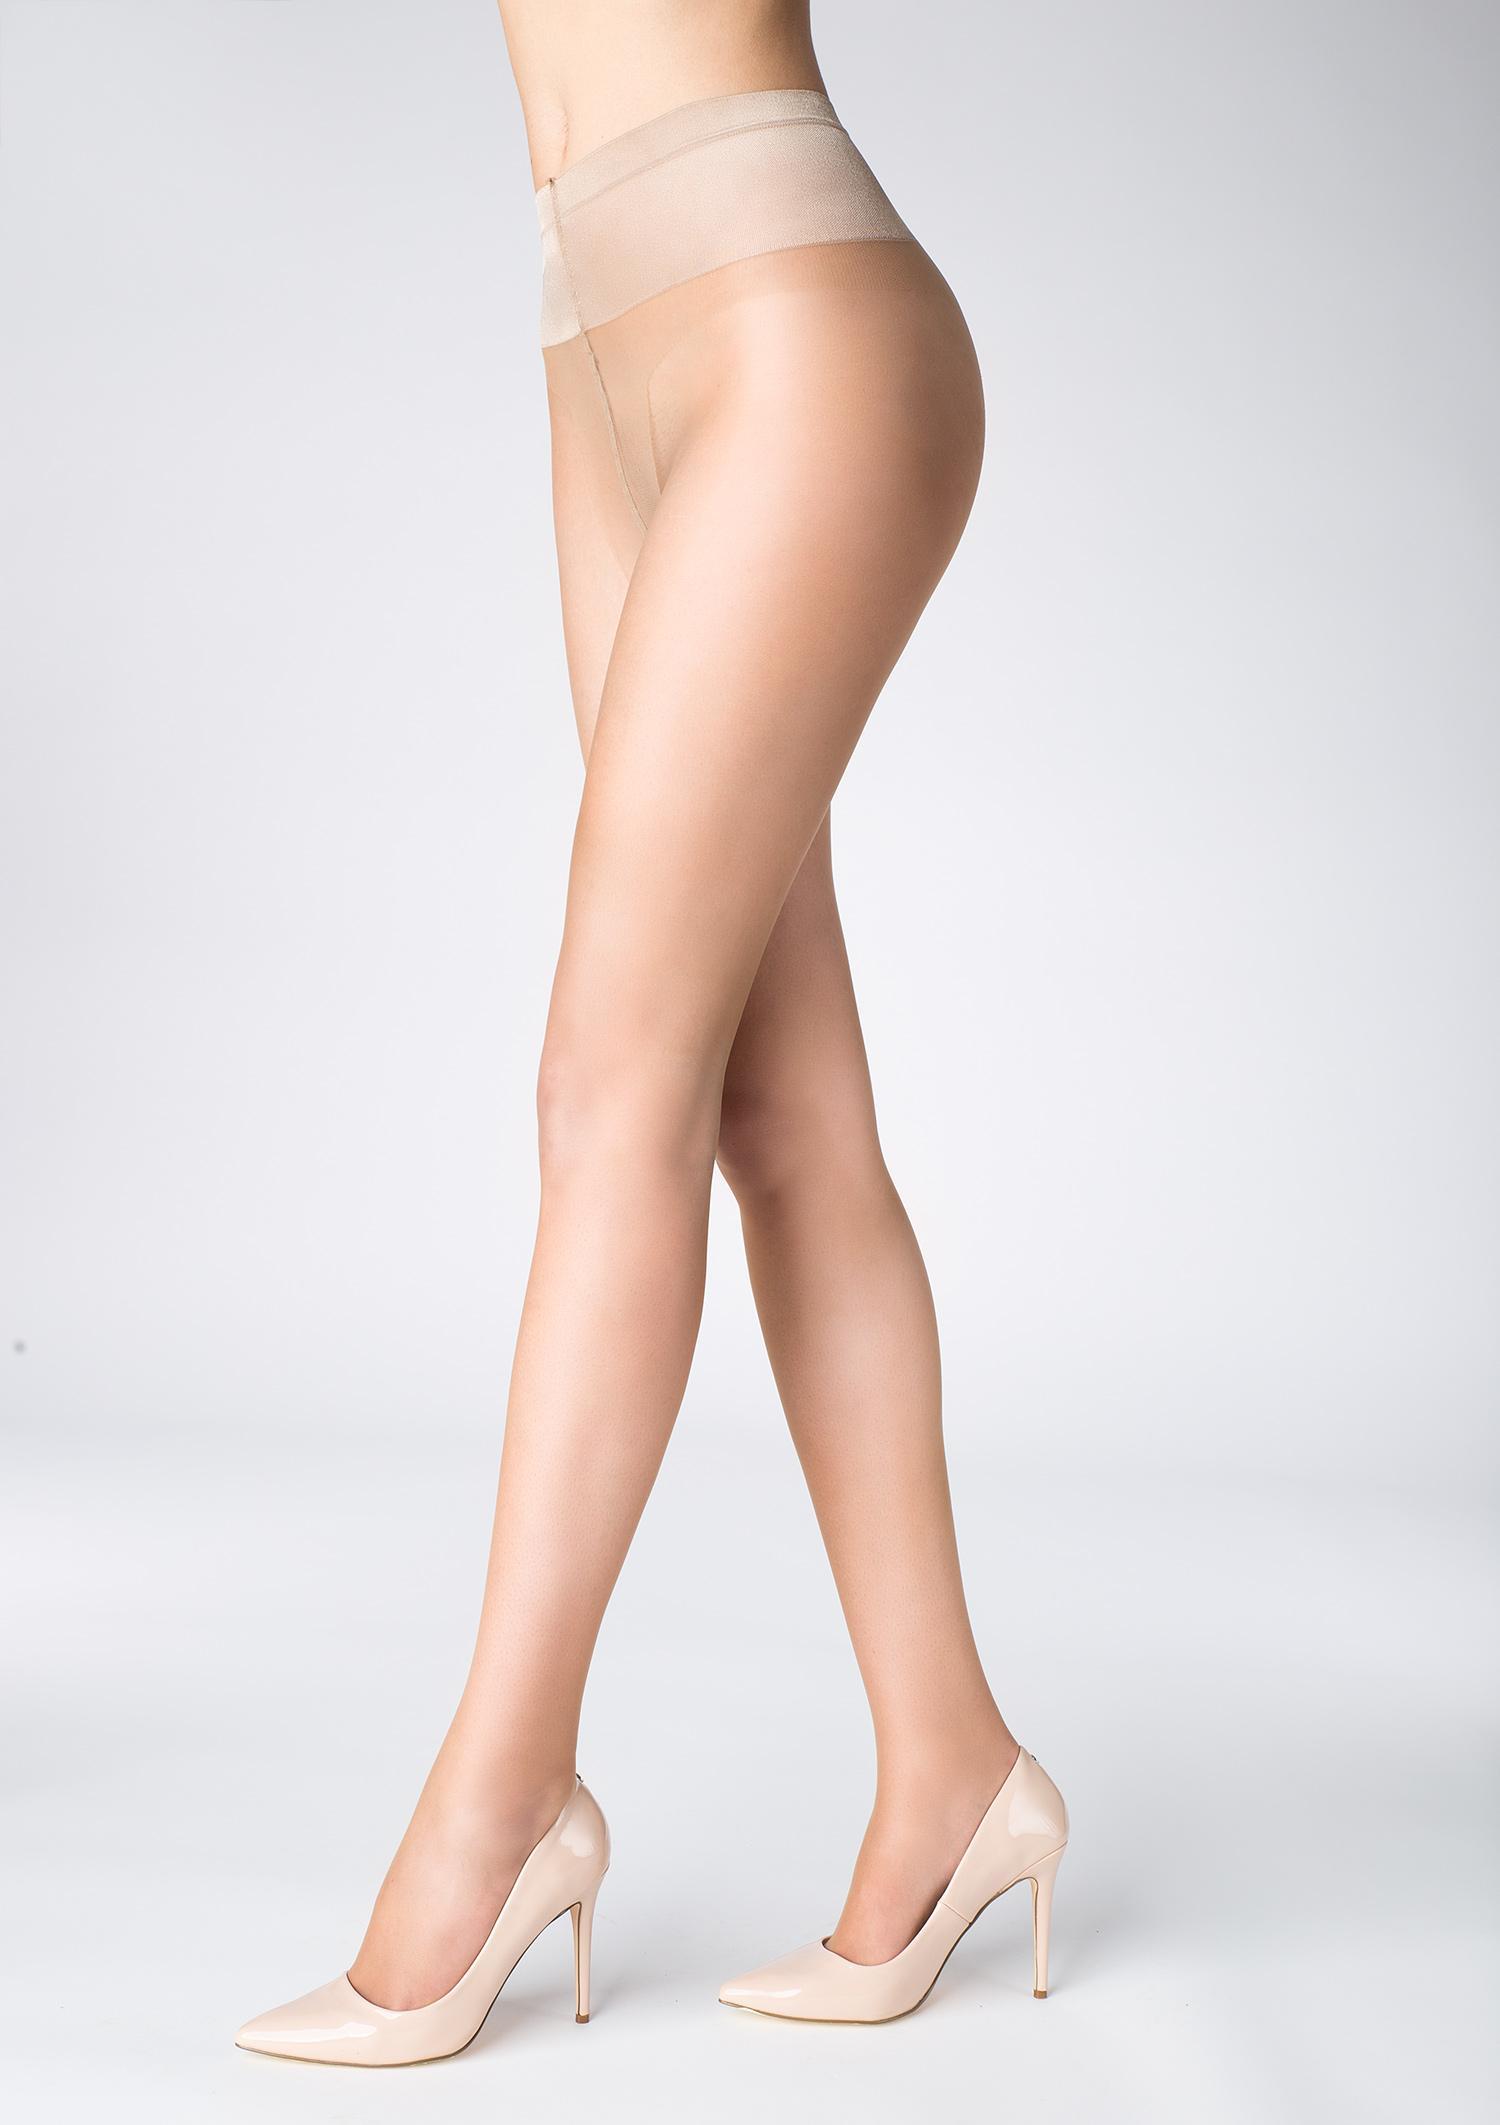 https://golden-legs.com.ua/images/stories/virtuemart/product/Make-Up_glace.jpg